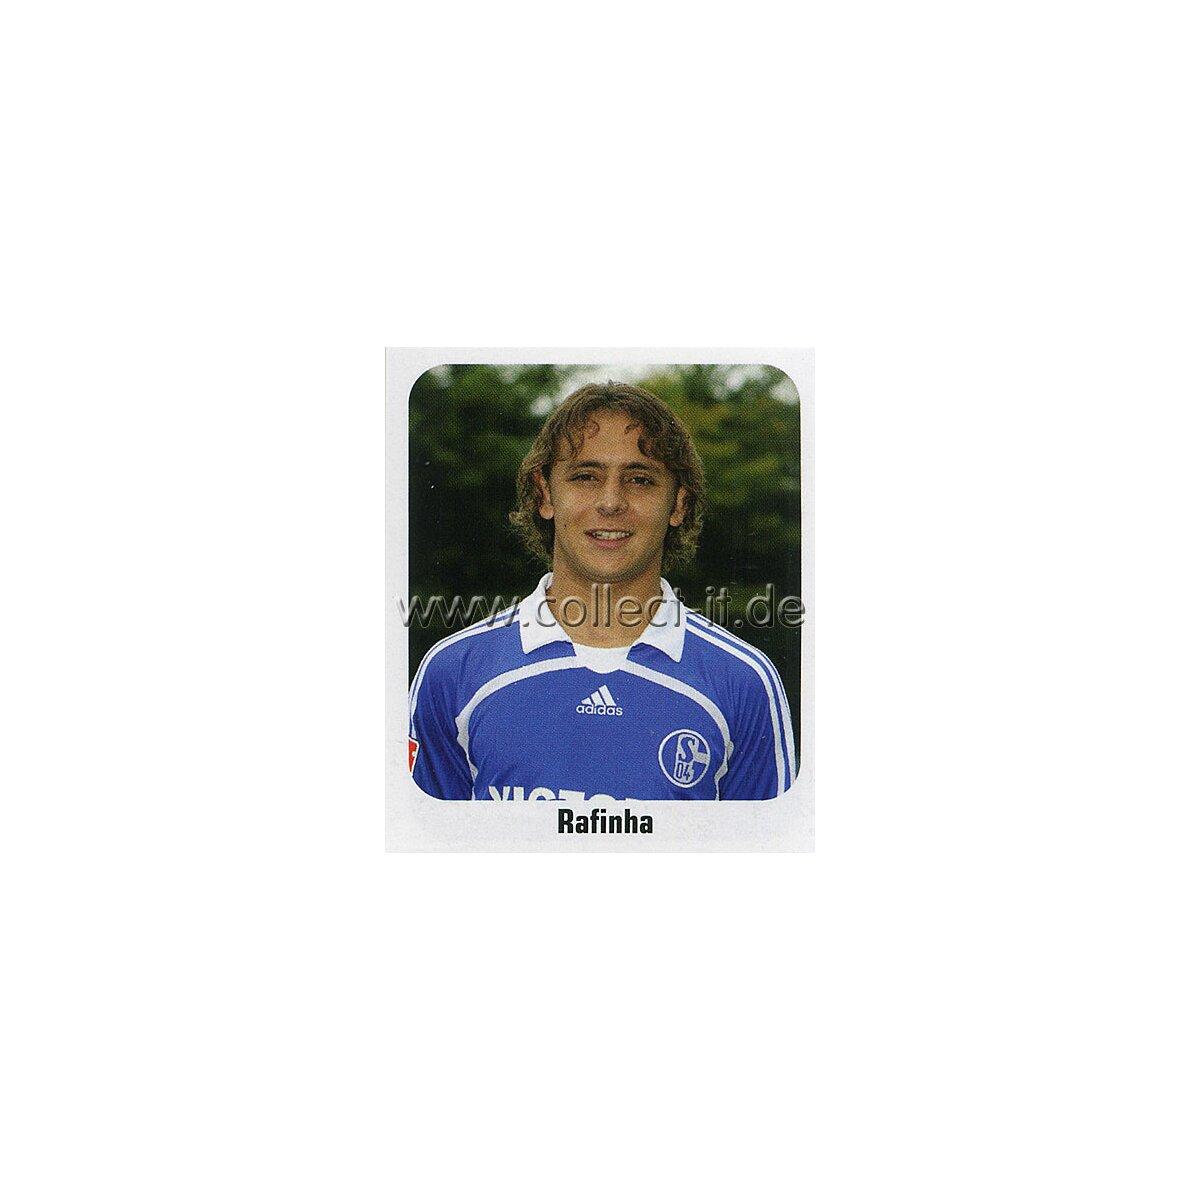 Panini 419 BL Fussball 2006//07 Frank Rost FC Schalke 04